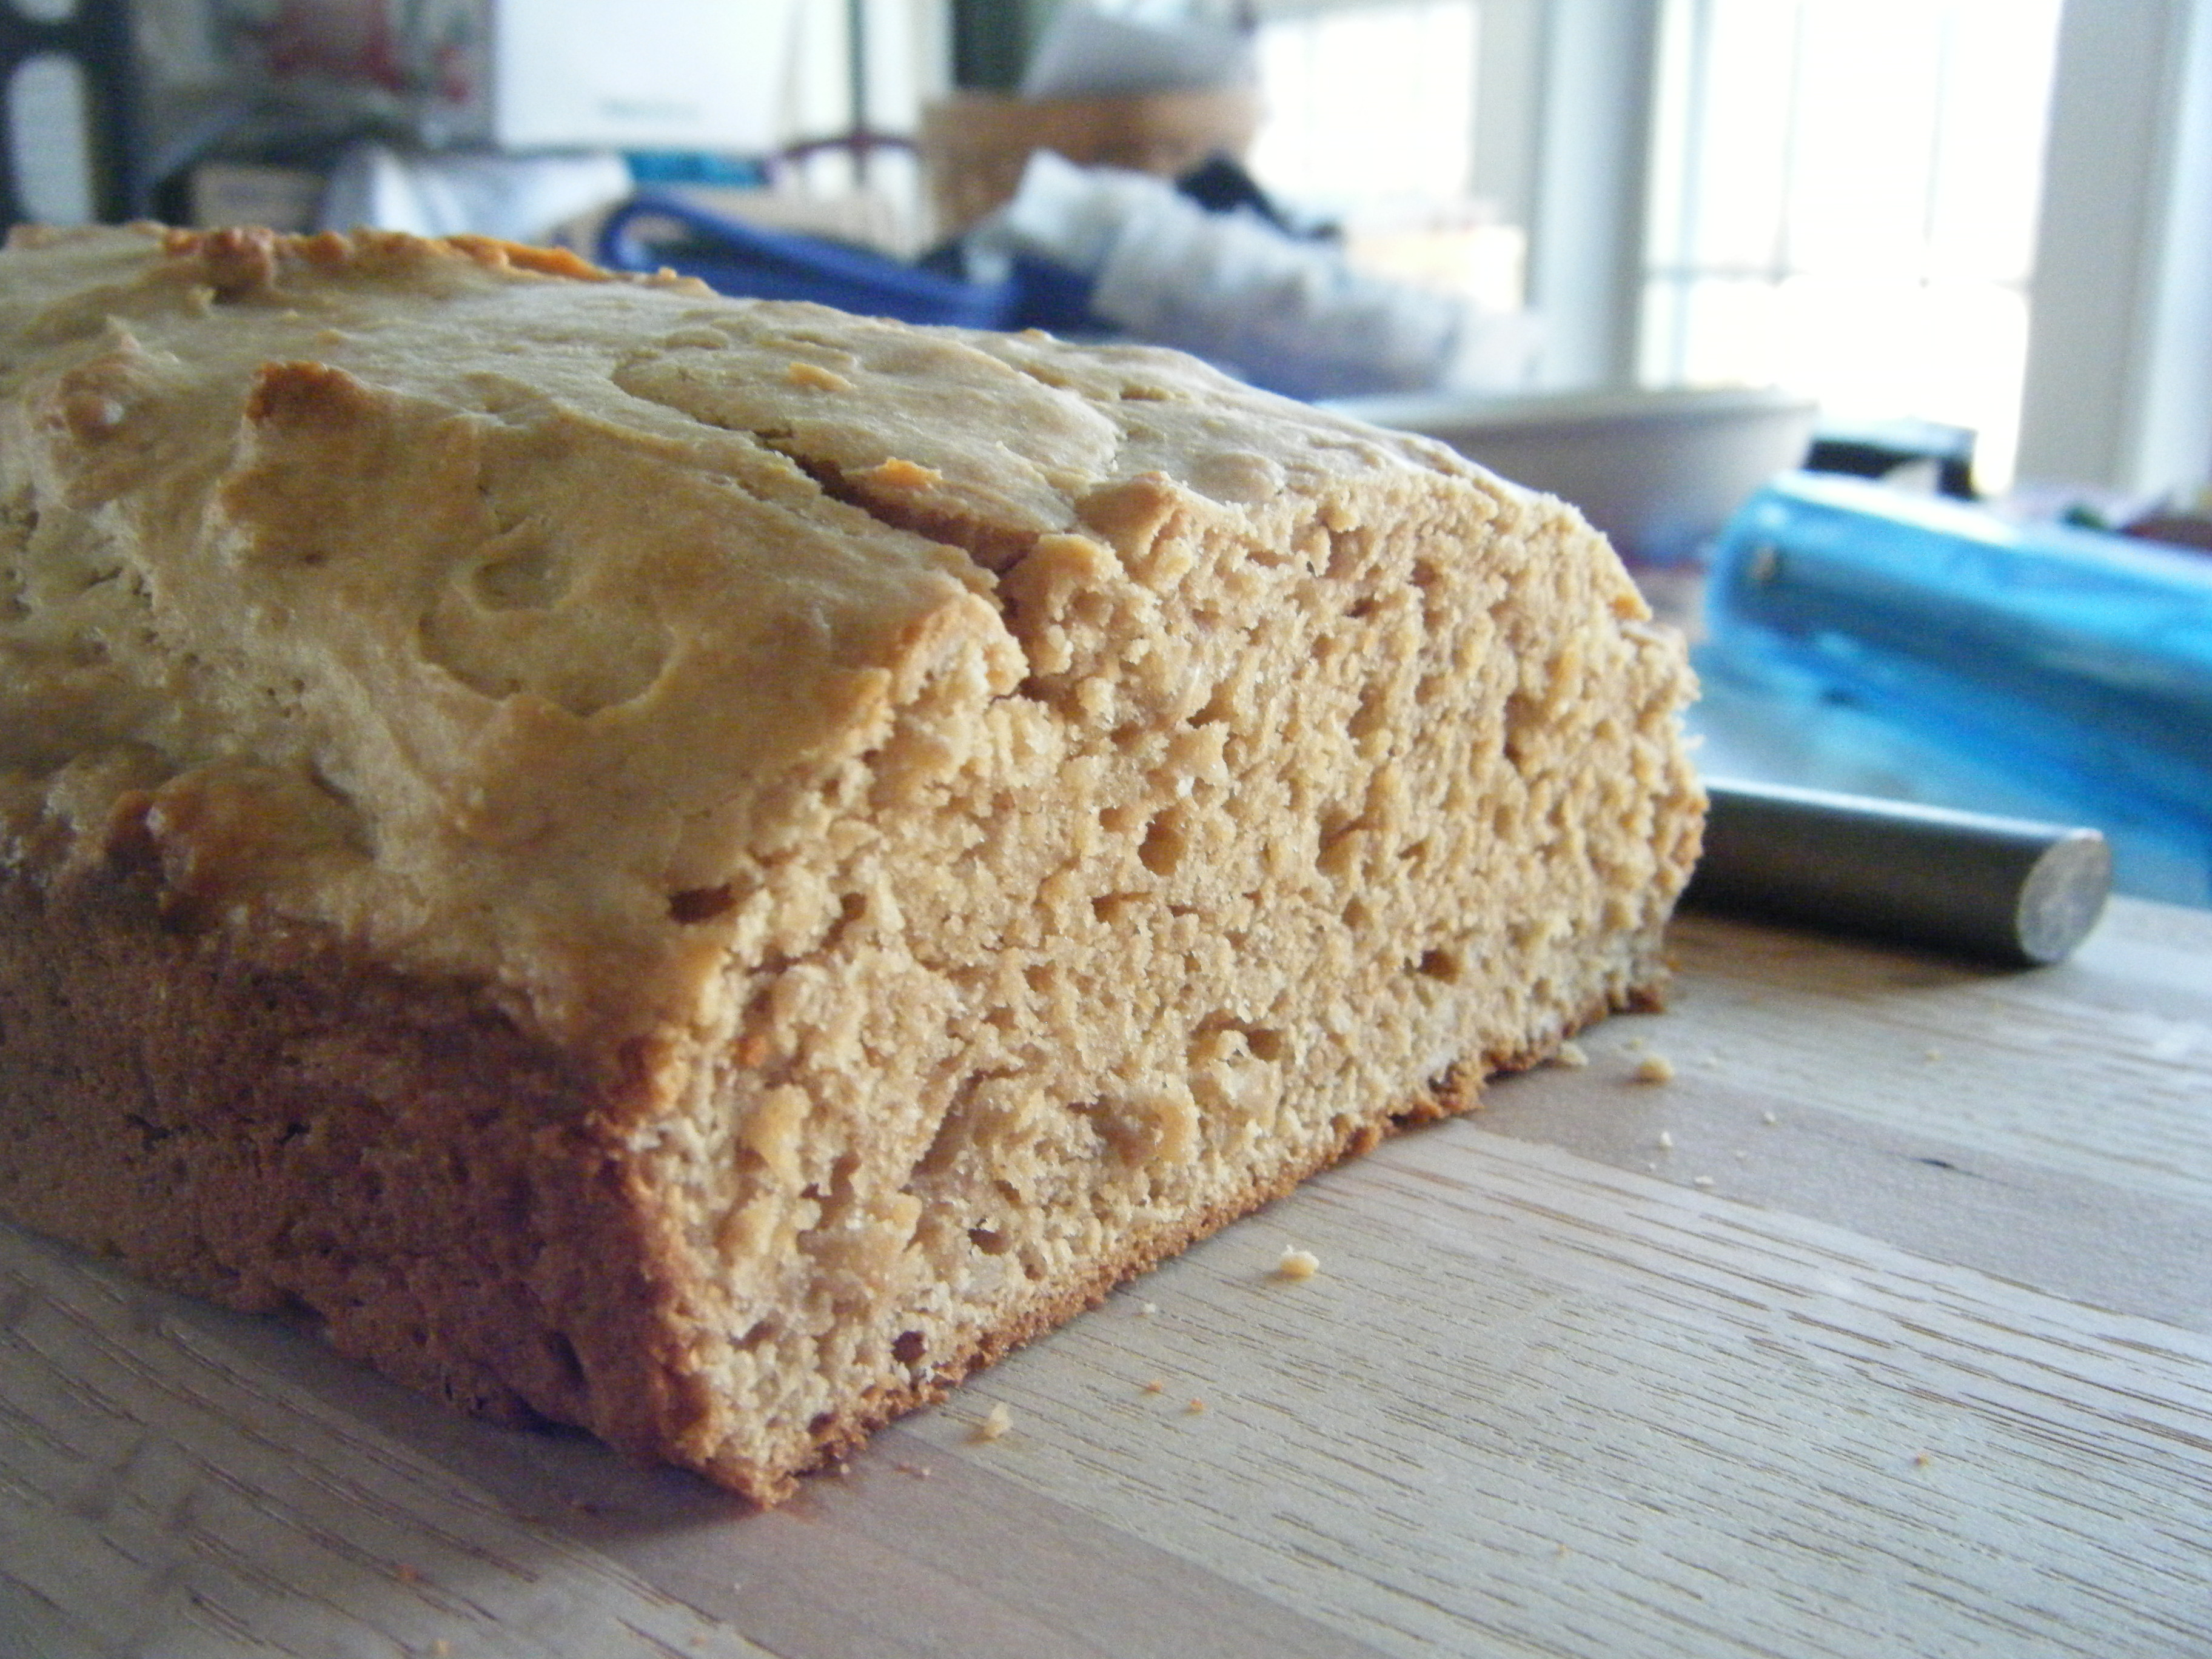 Peanut Butter Bread | Tasty Kitchen: A Happy Recipe Community!